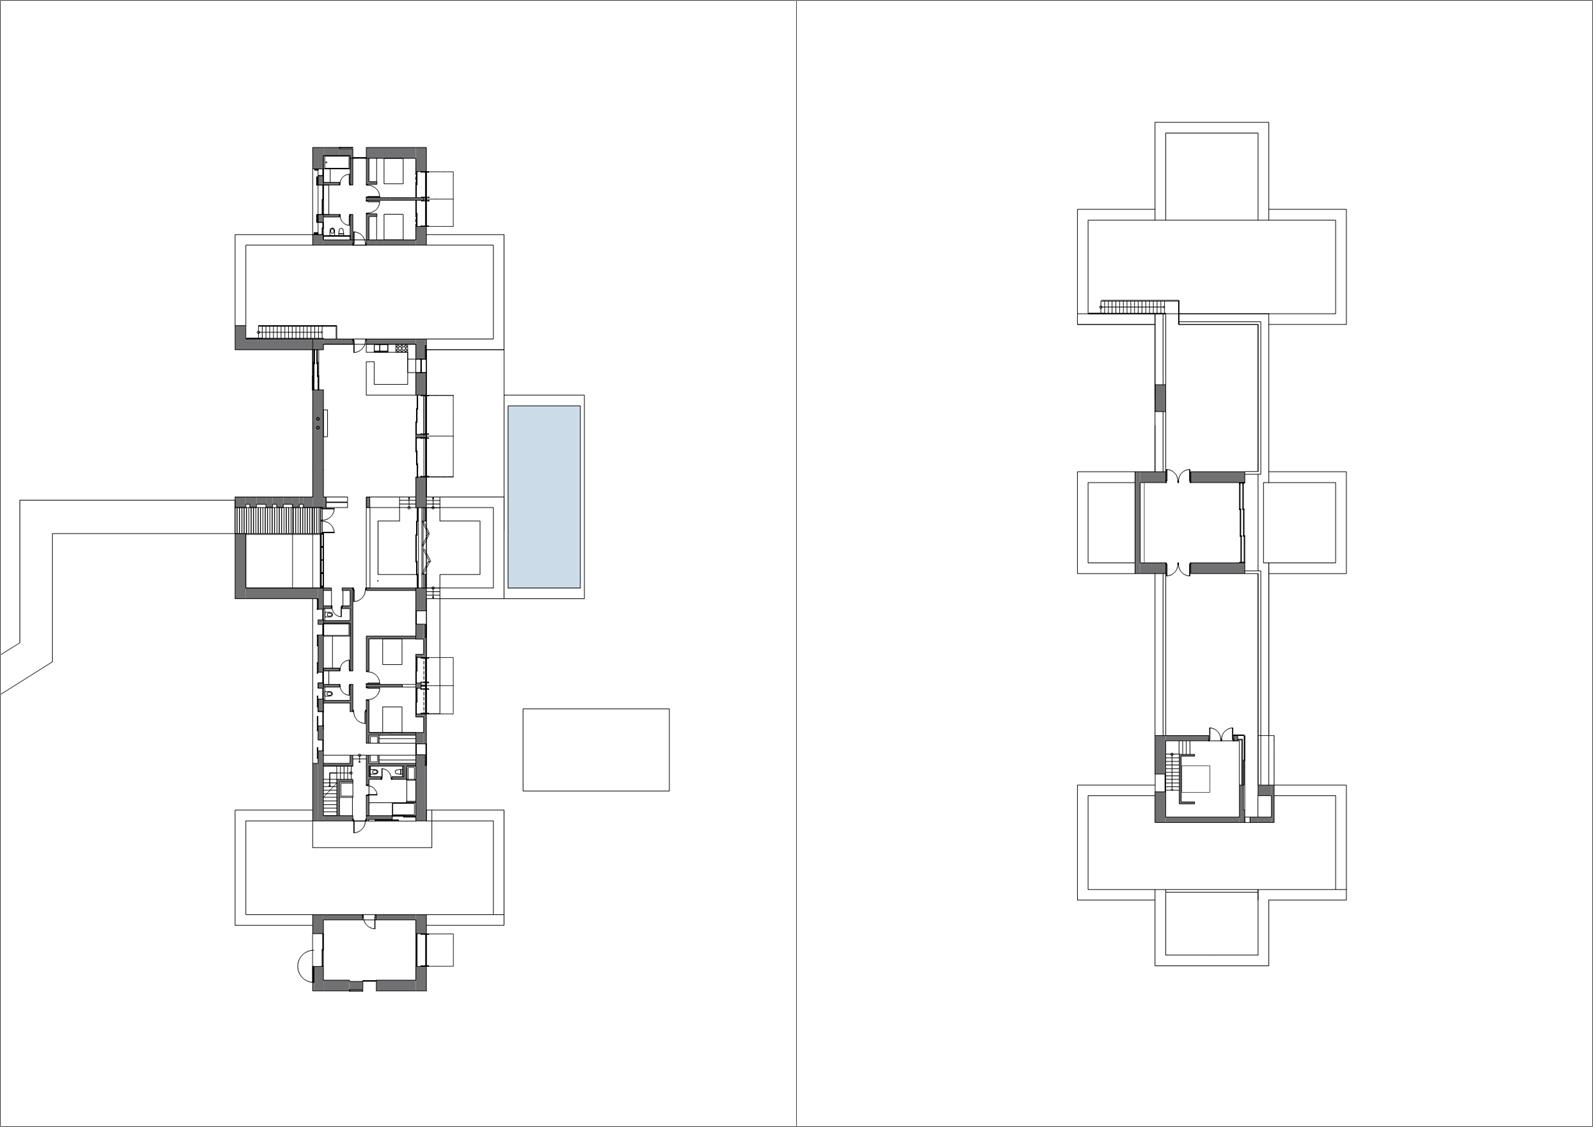 co-habitation floor plans 1